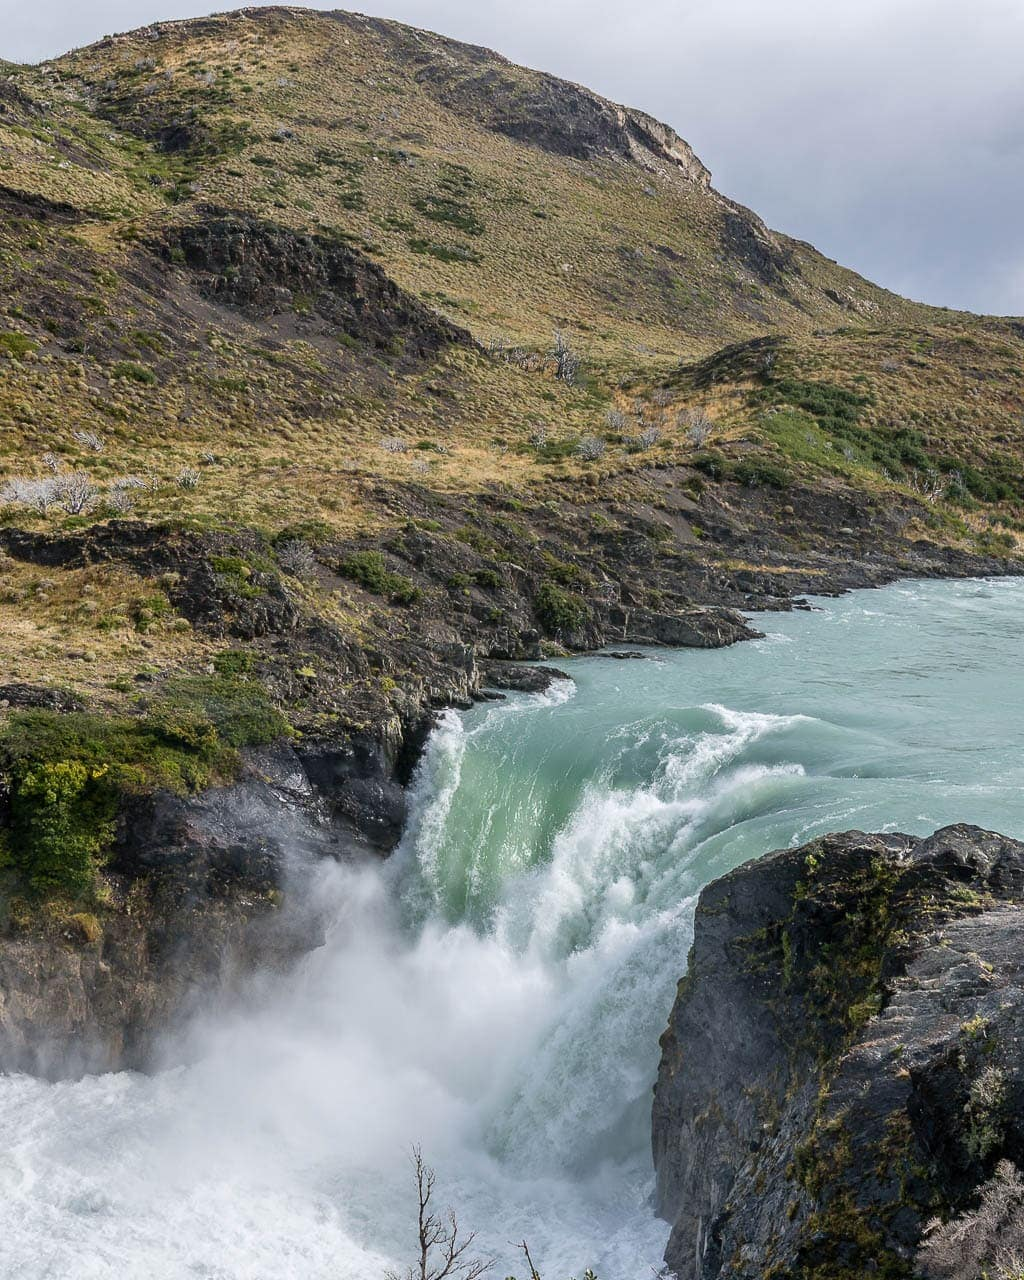 Salto Grande in Torres del Paine National Park, Chile